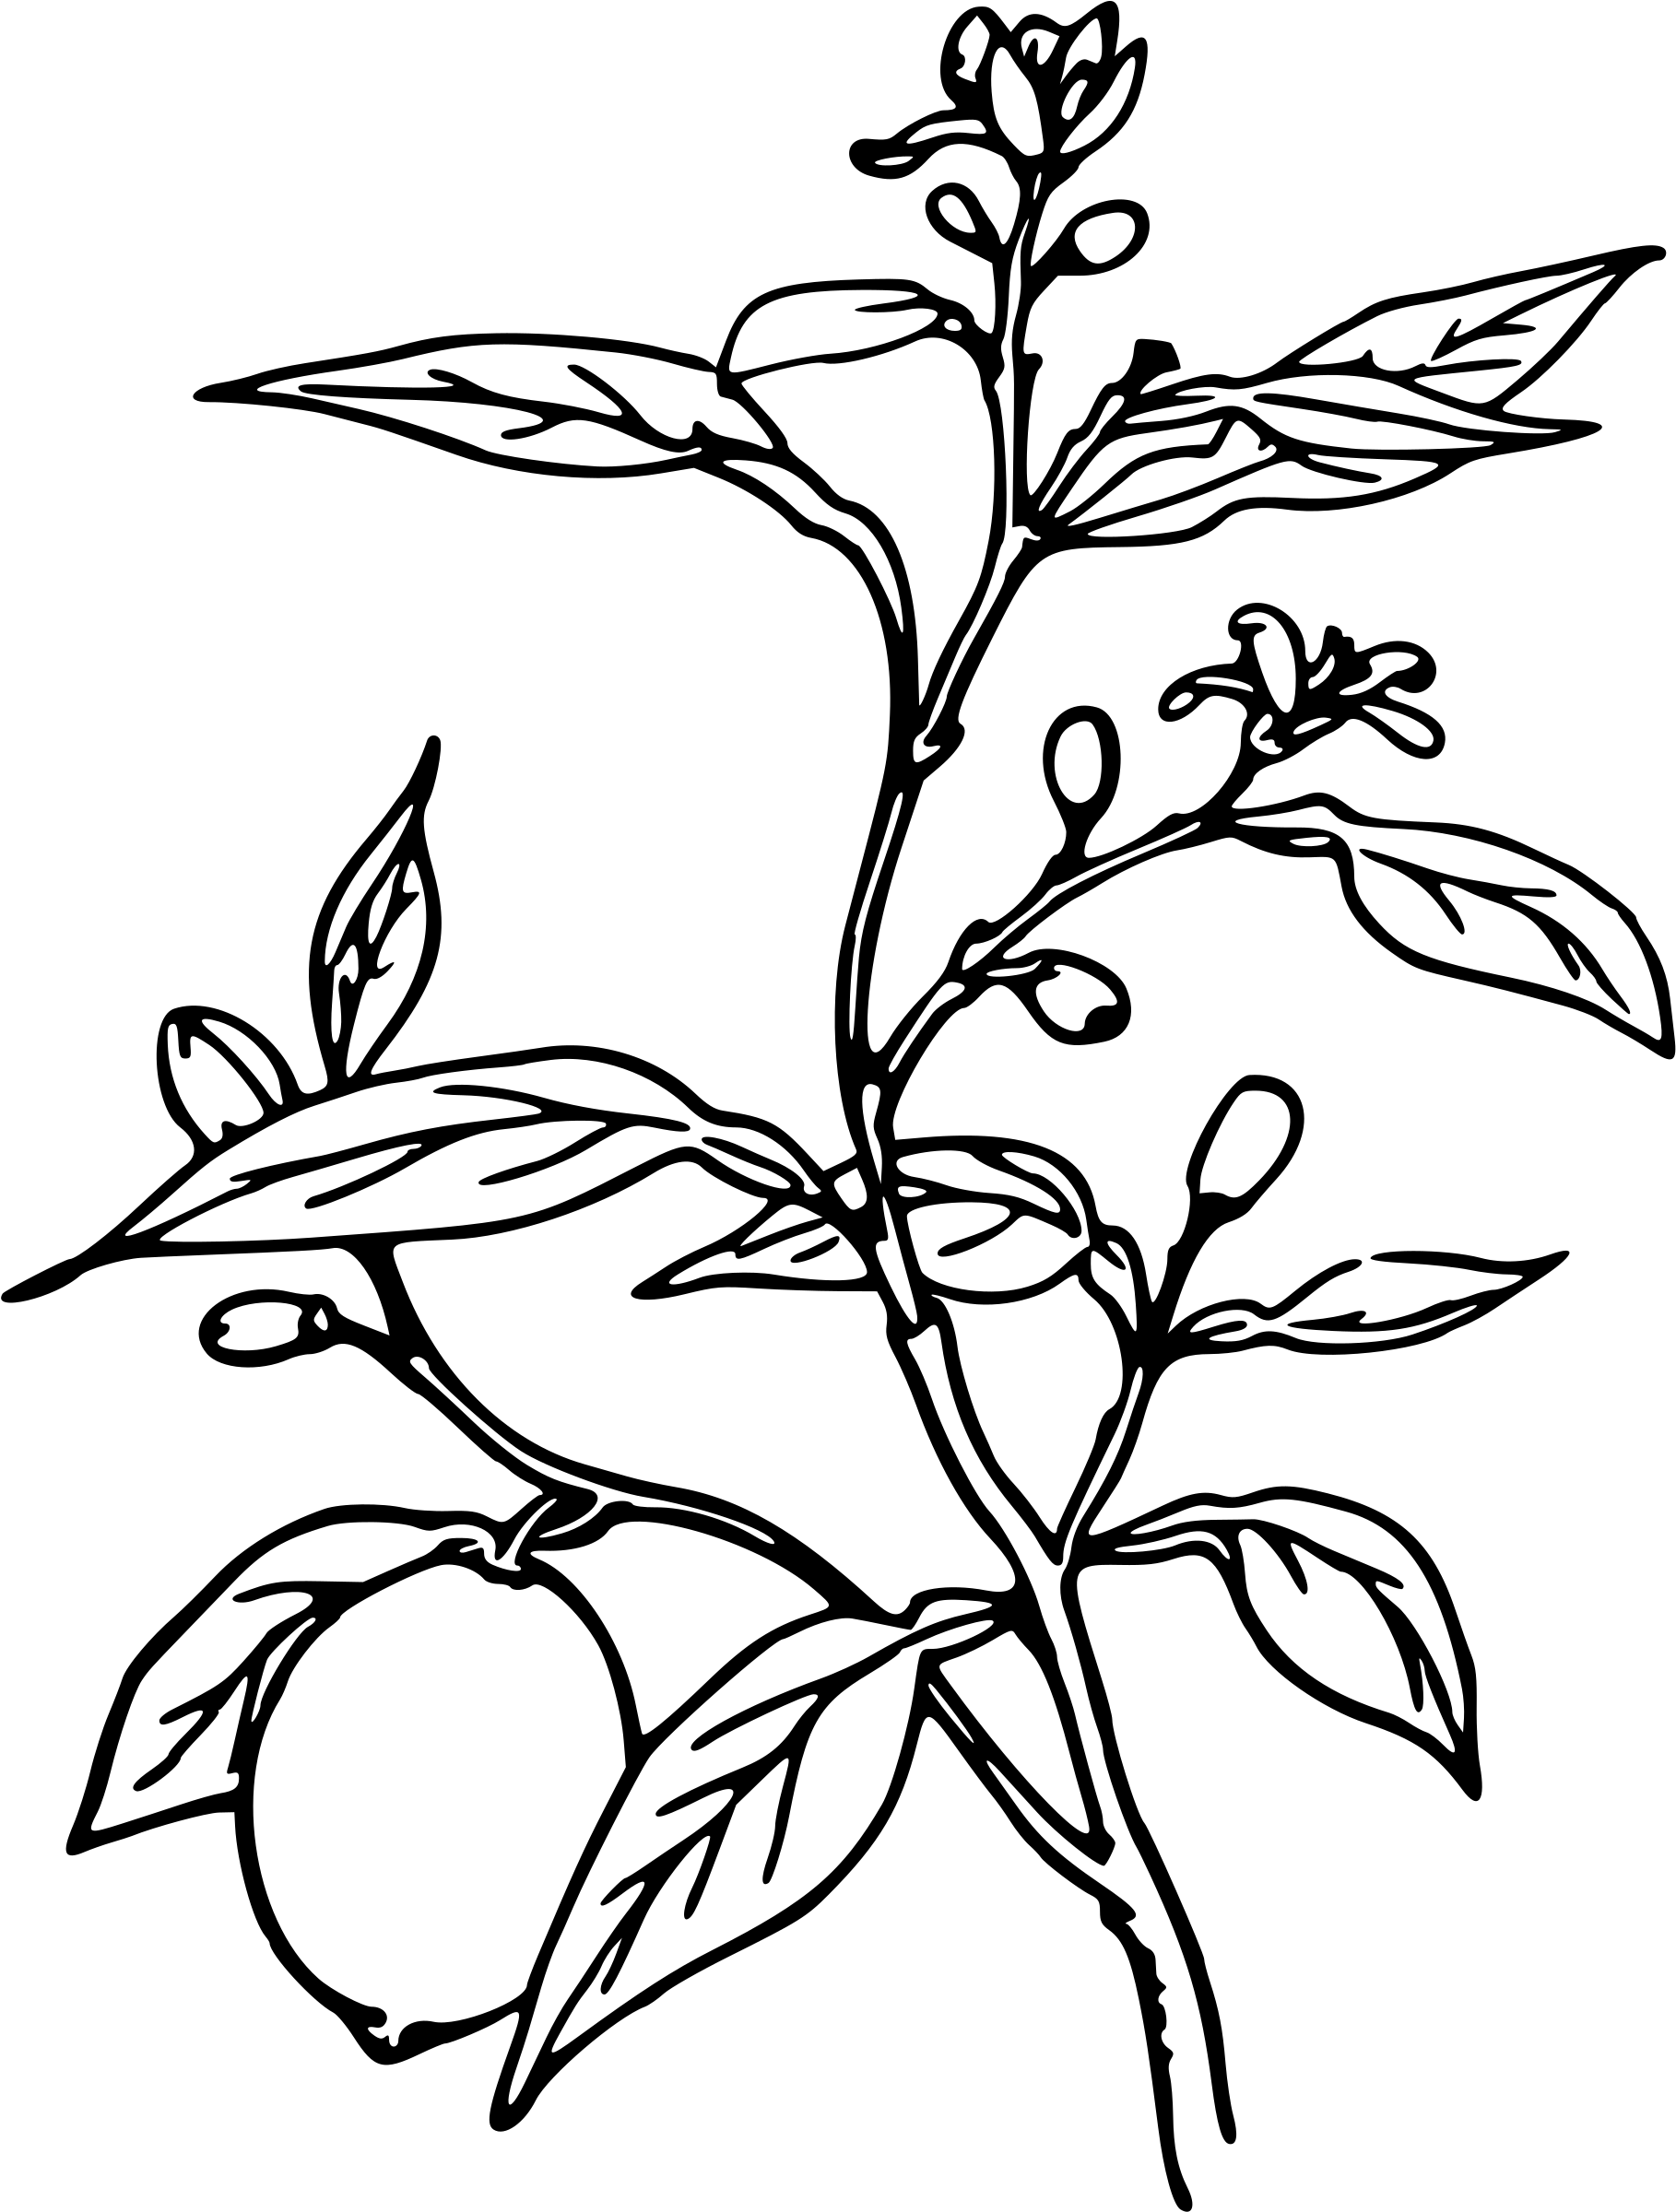 1818x2400 Lemon Tree Clipart Black And White